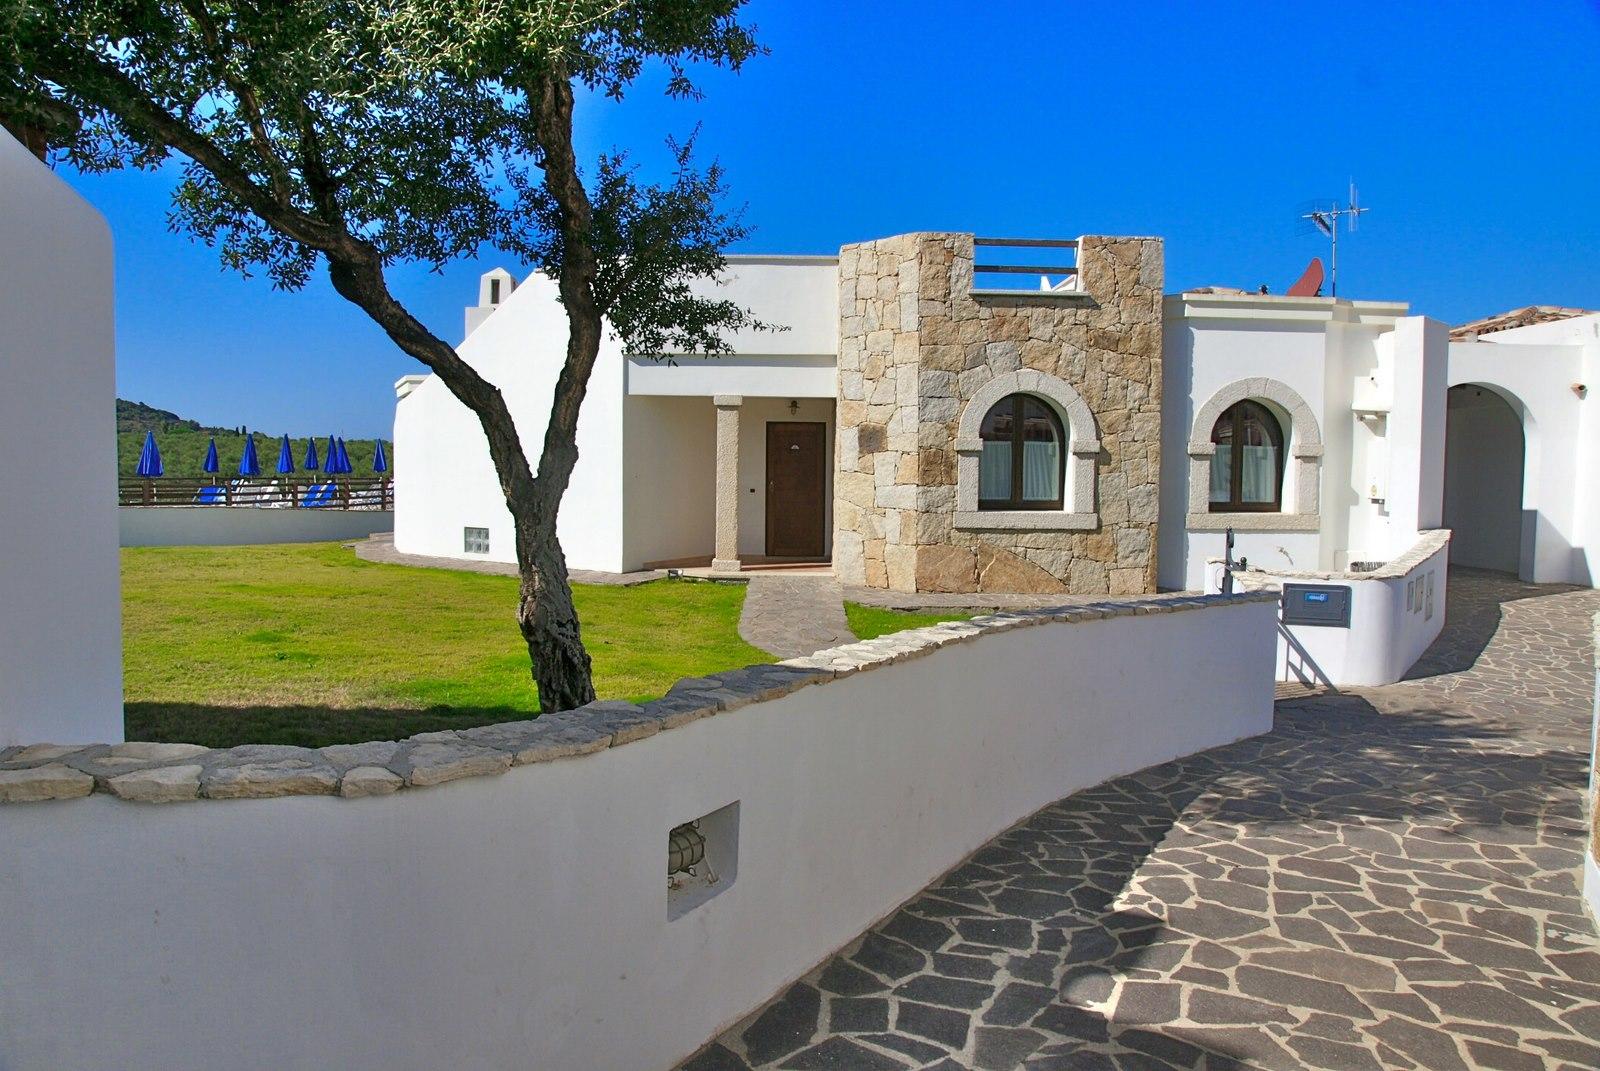 Ferienhaus Carru (877334), Sant Angelo Custode, Sassari, Sardinien, Italien, Bild 12